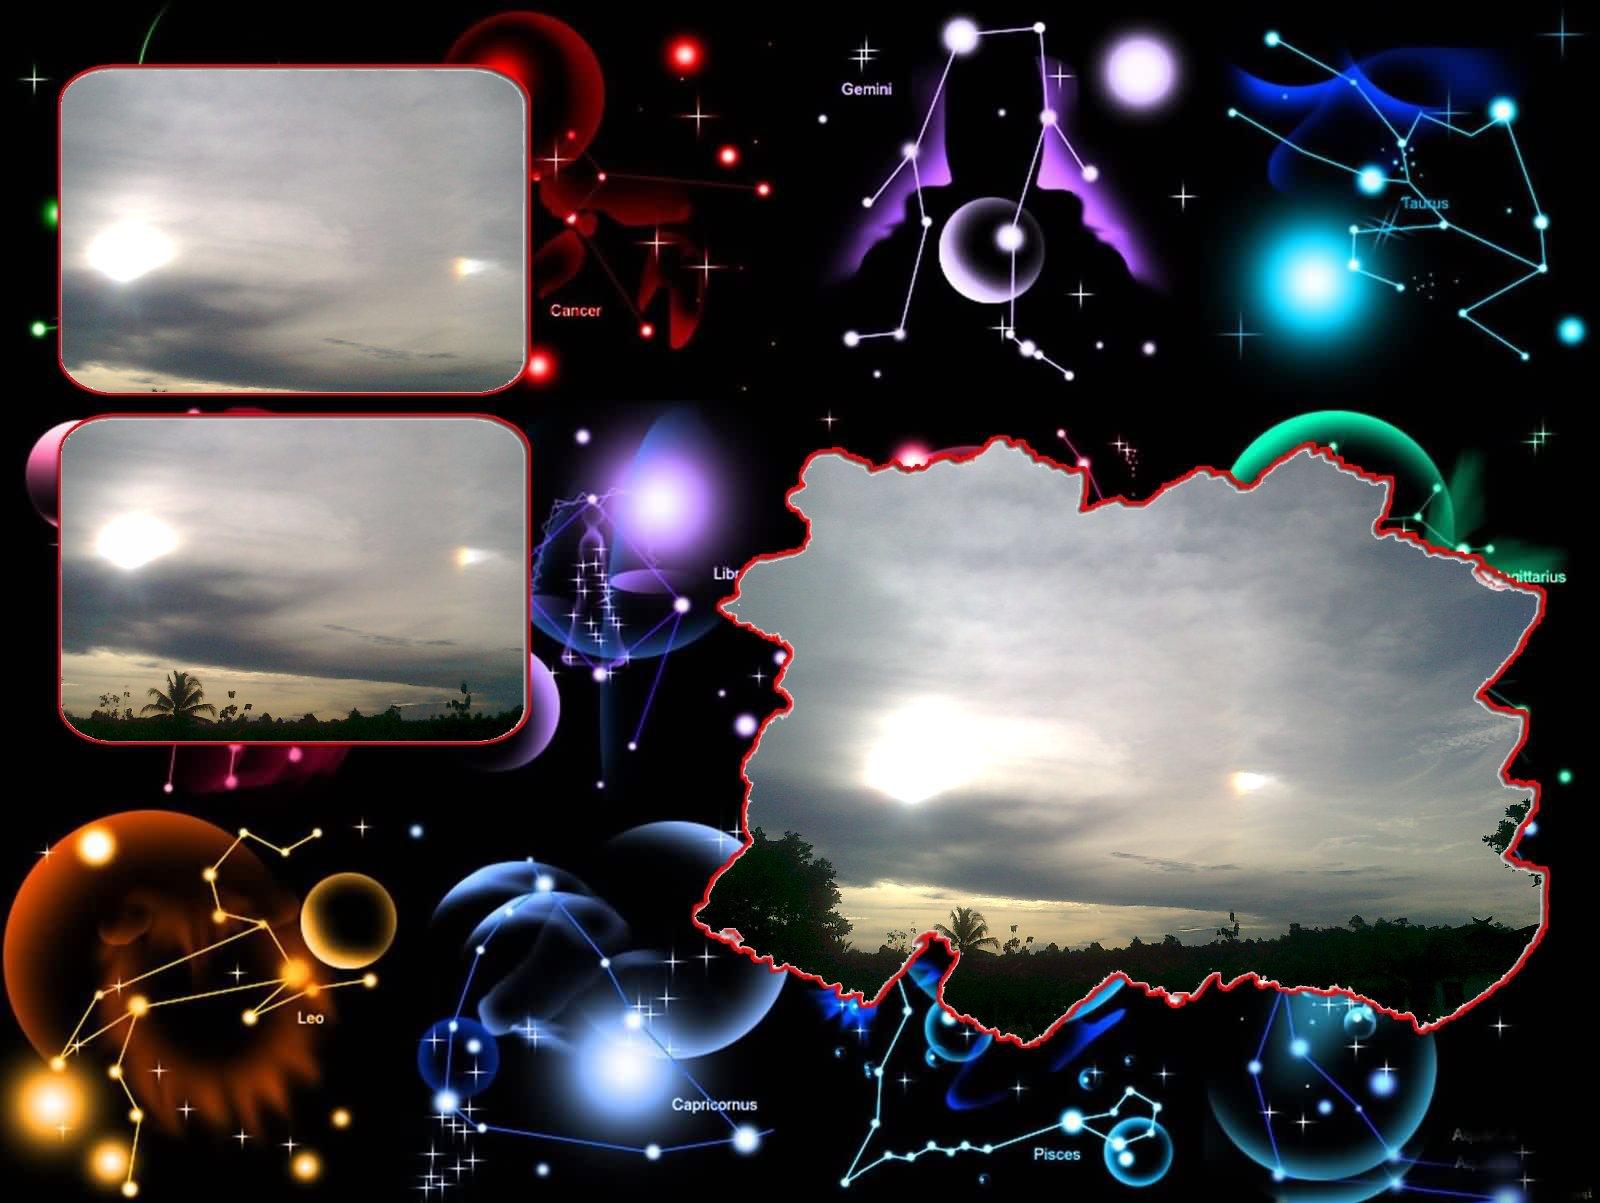 Artikel Tentang Macam Macam Seni.html - Alternative Energy